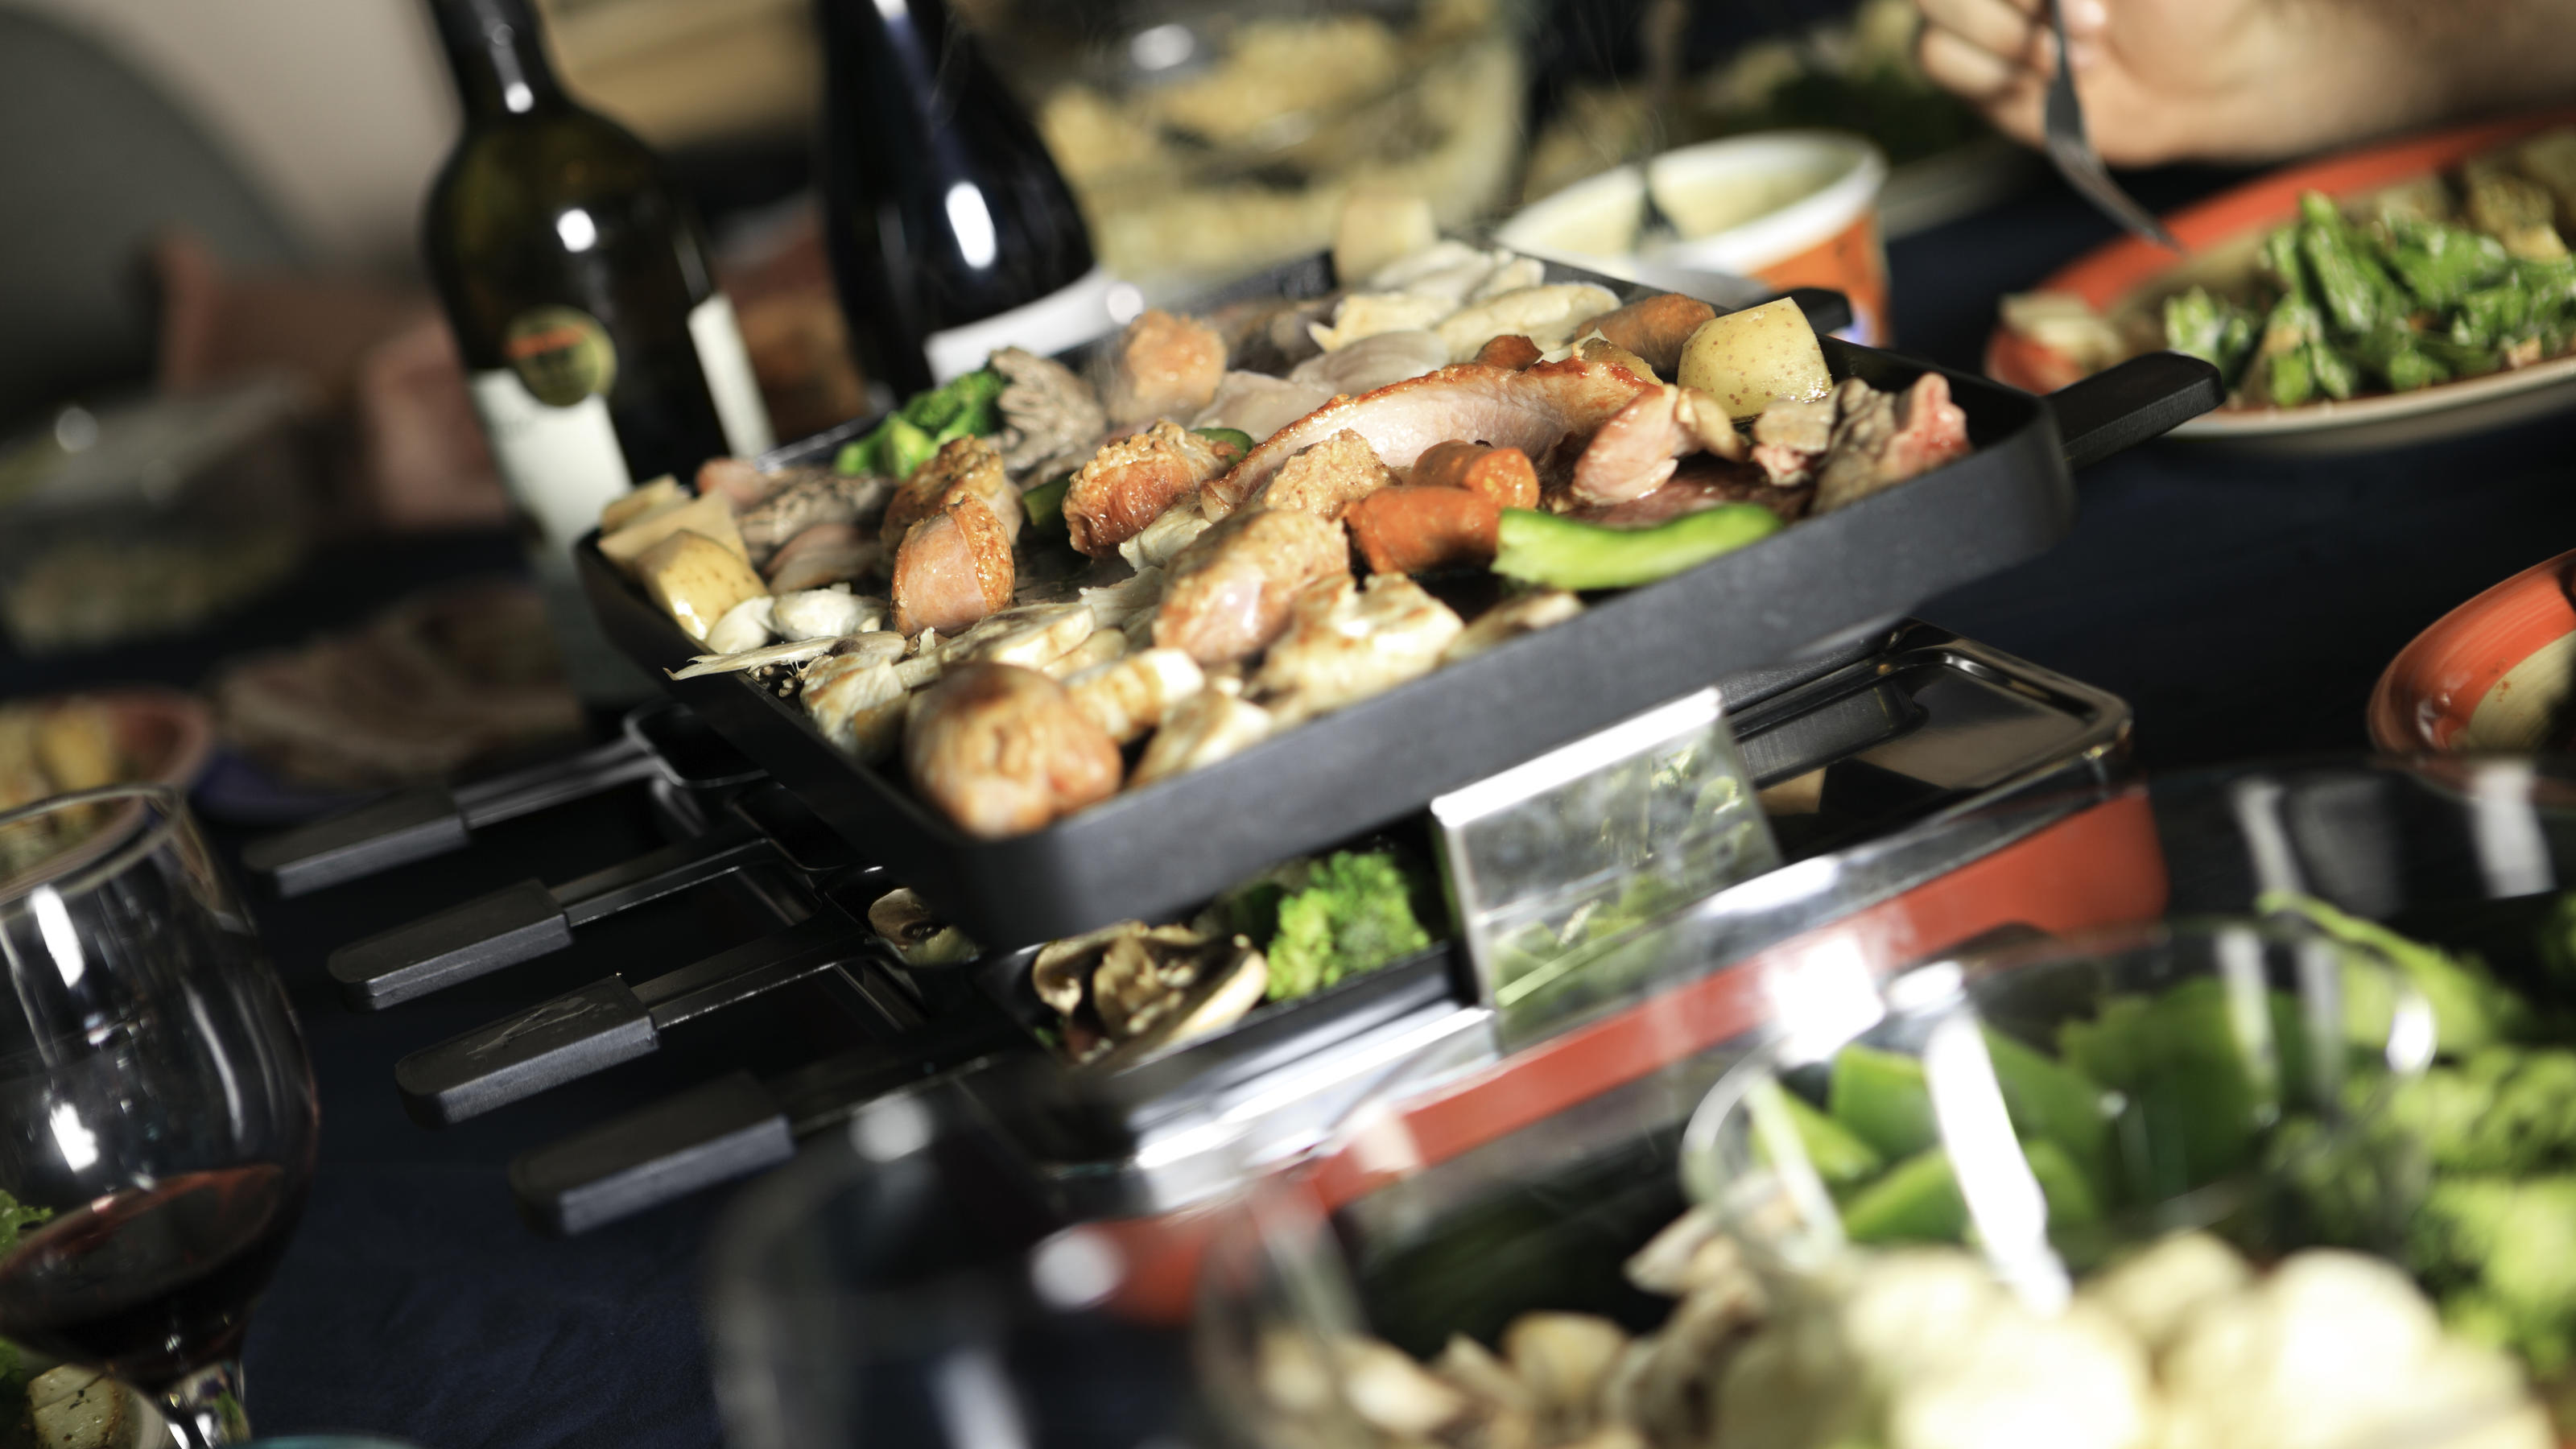 Landmann Gasgrill Säubern : Grillrost reinigen: so wird ihr grill wieder sauber kochbar.de